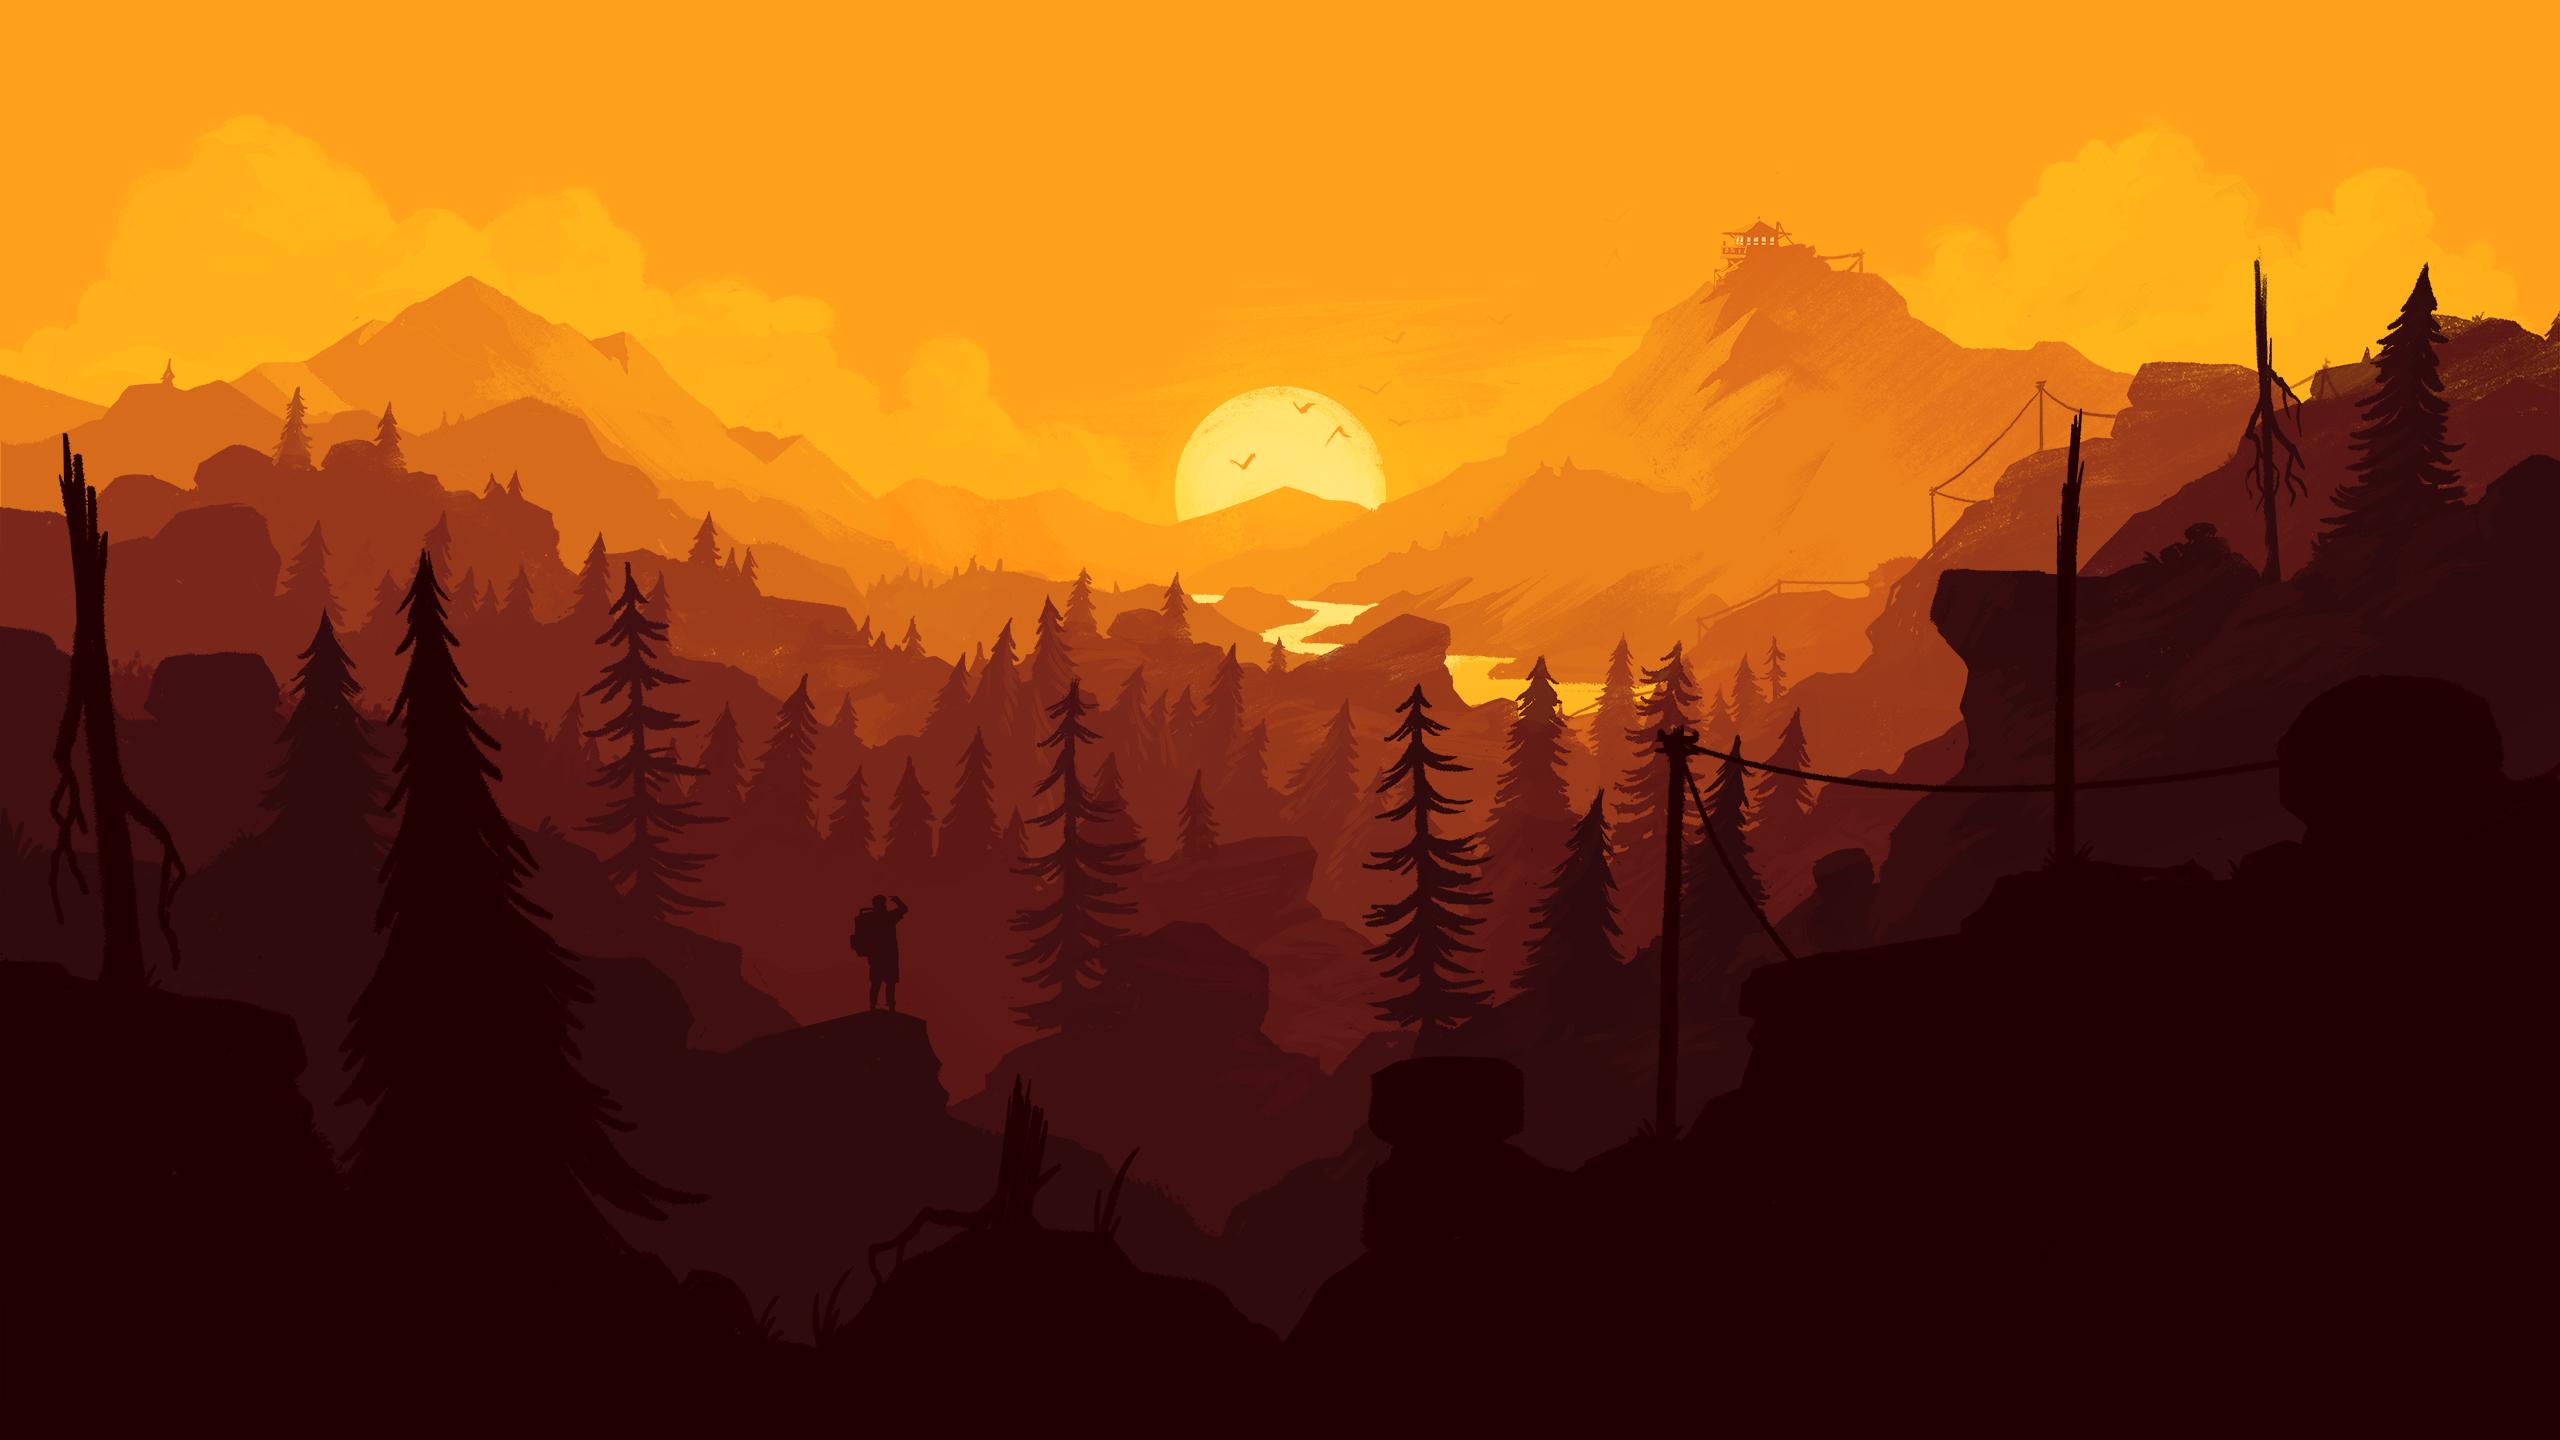 5118406-orange-wallpaper